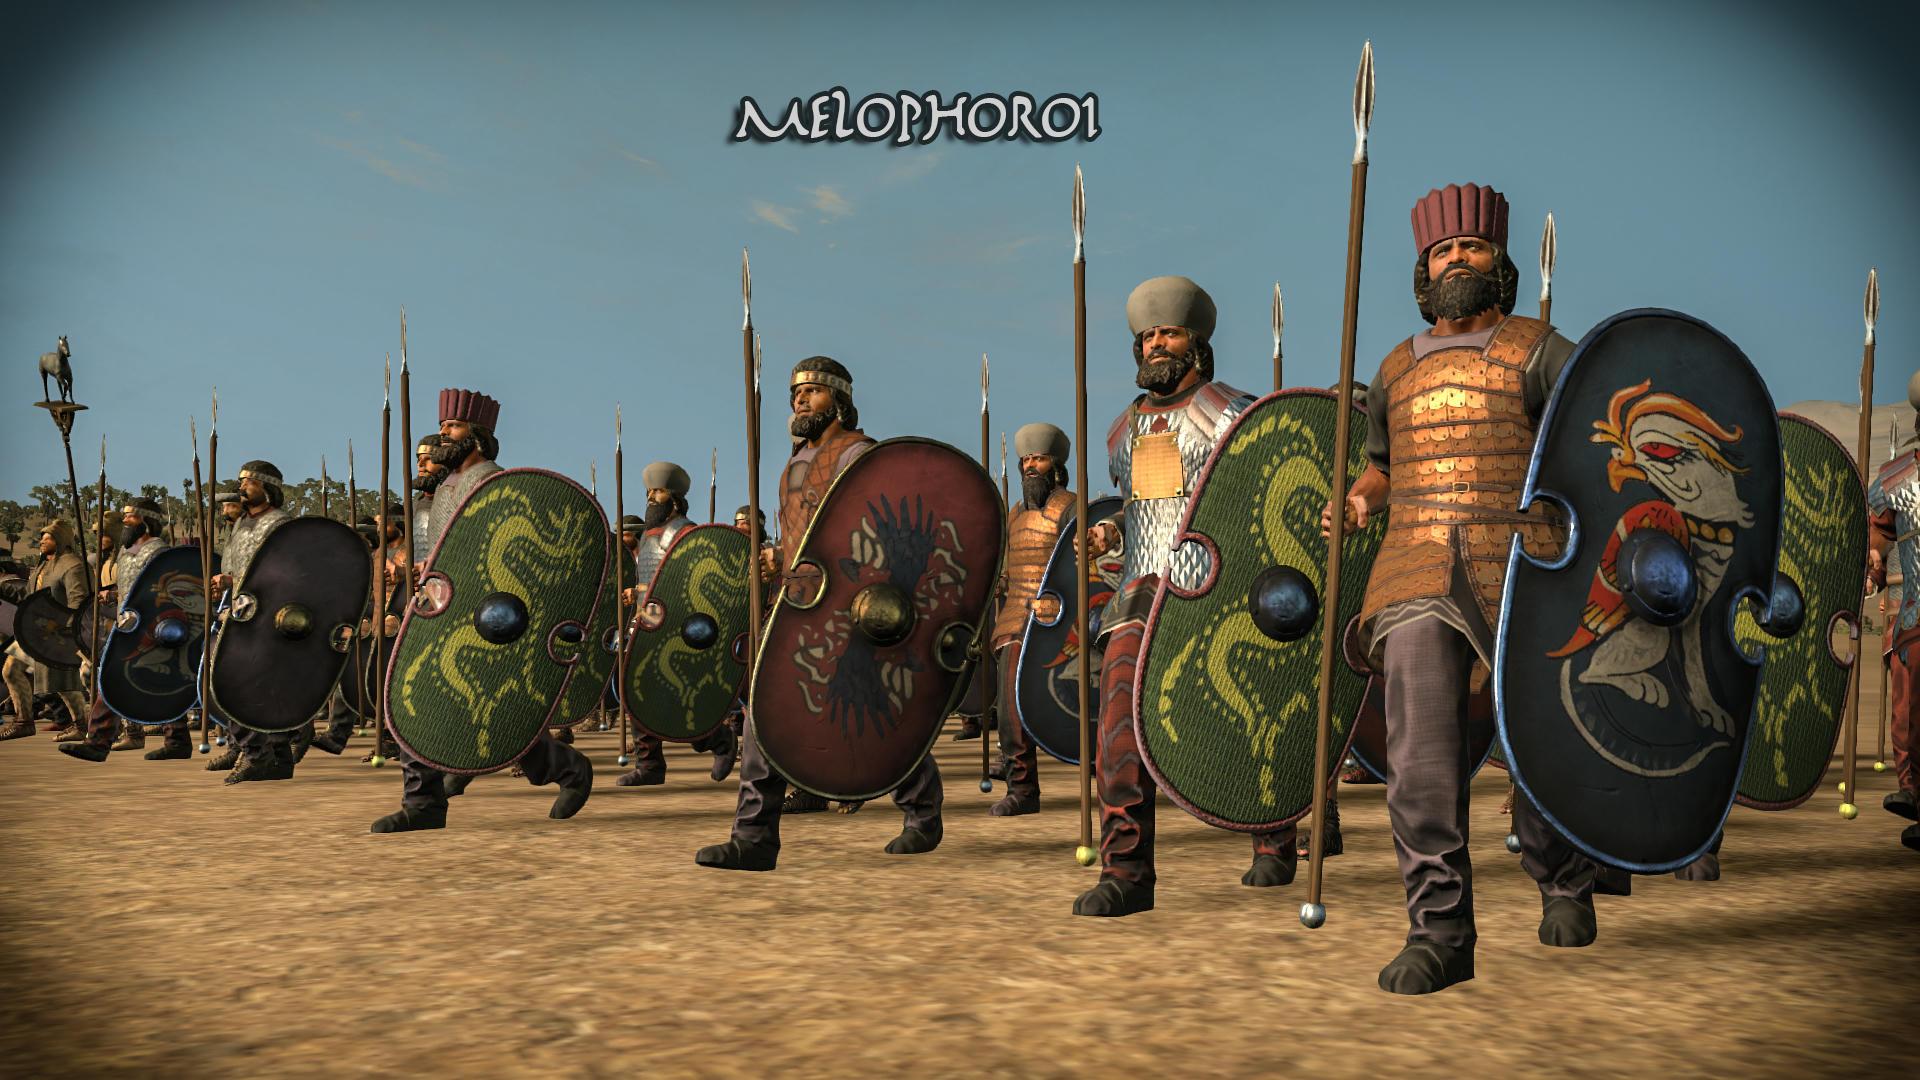 [Preview] Atropatkan (Atropatene) Ancient Persian Army